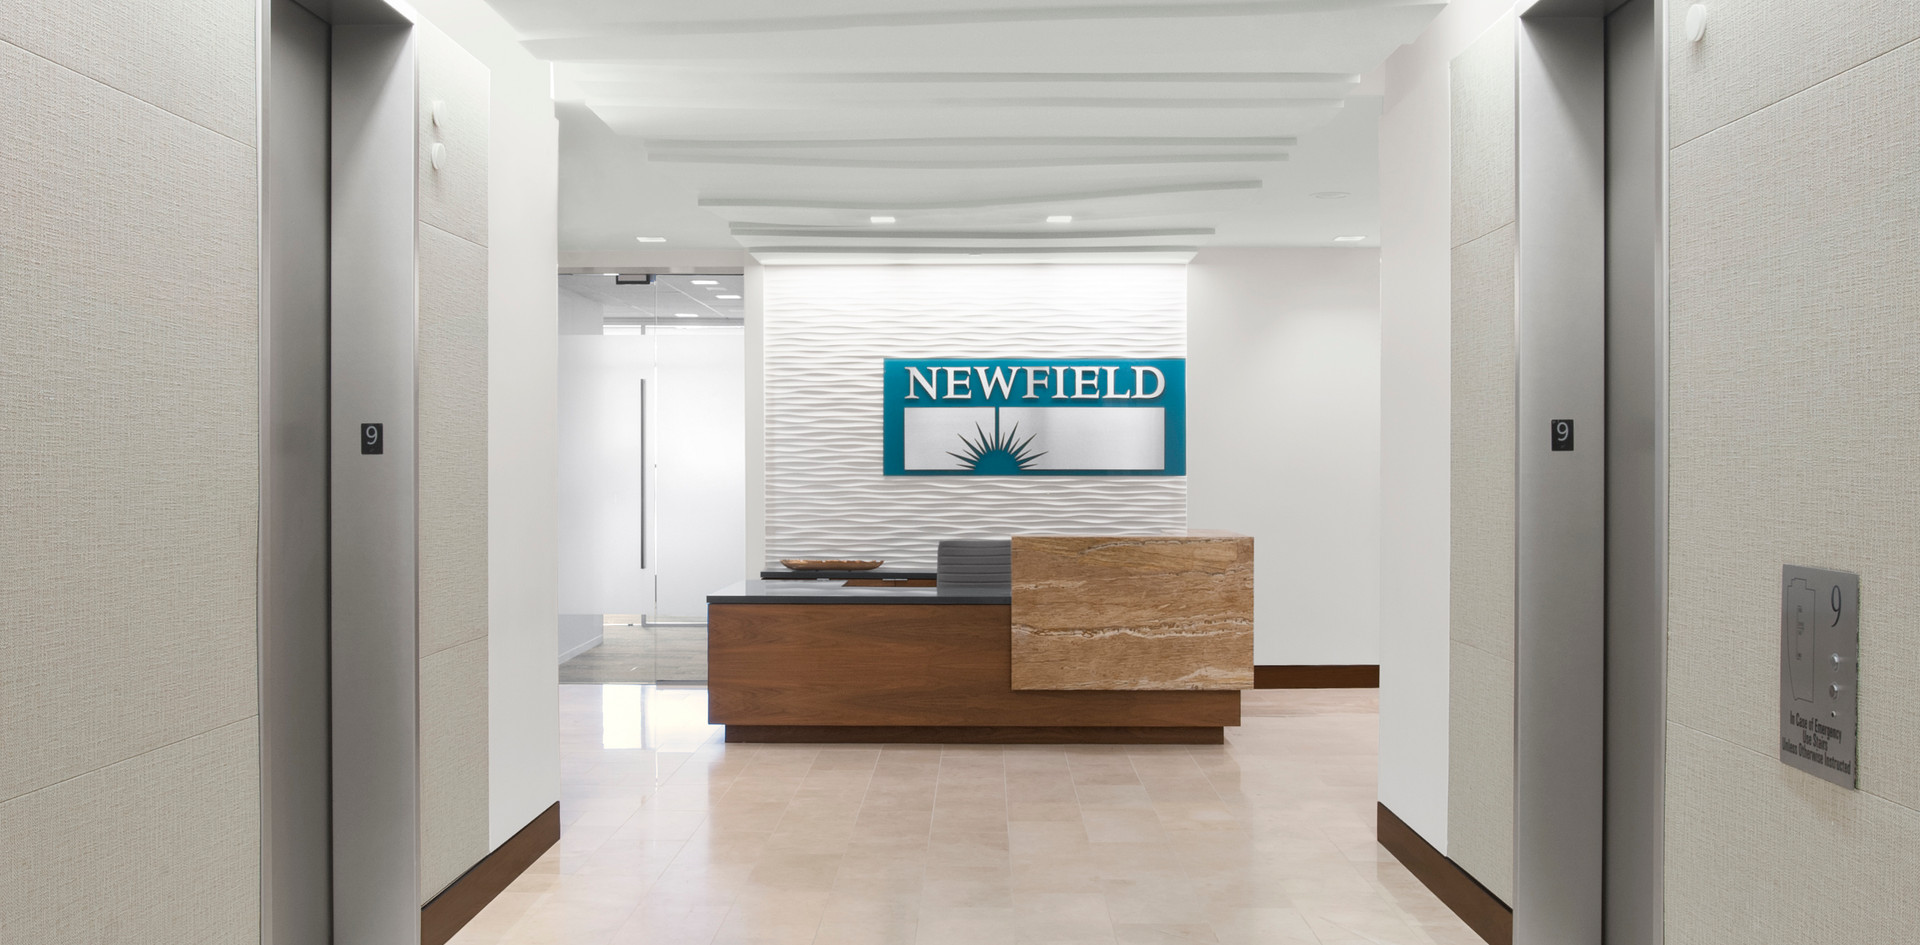 Newfield 4